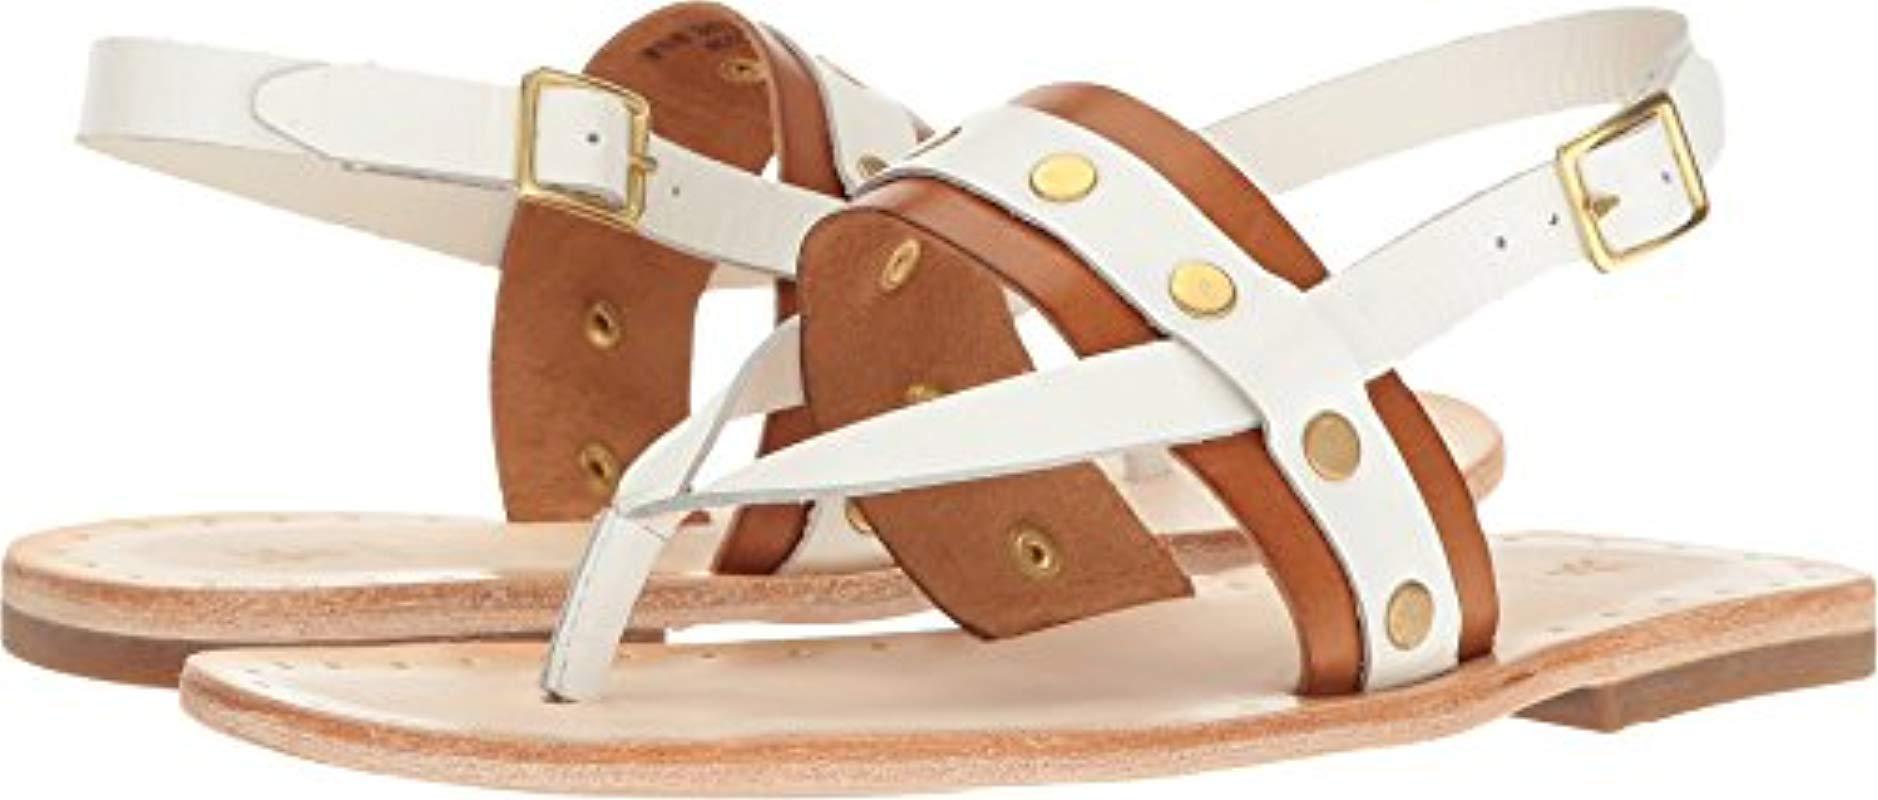 55f803717c3 Frye. Women s Avery Stud Thong Flat Sandal